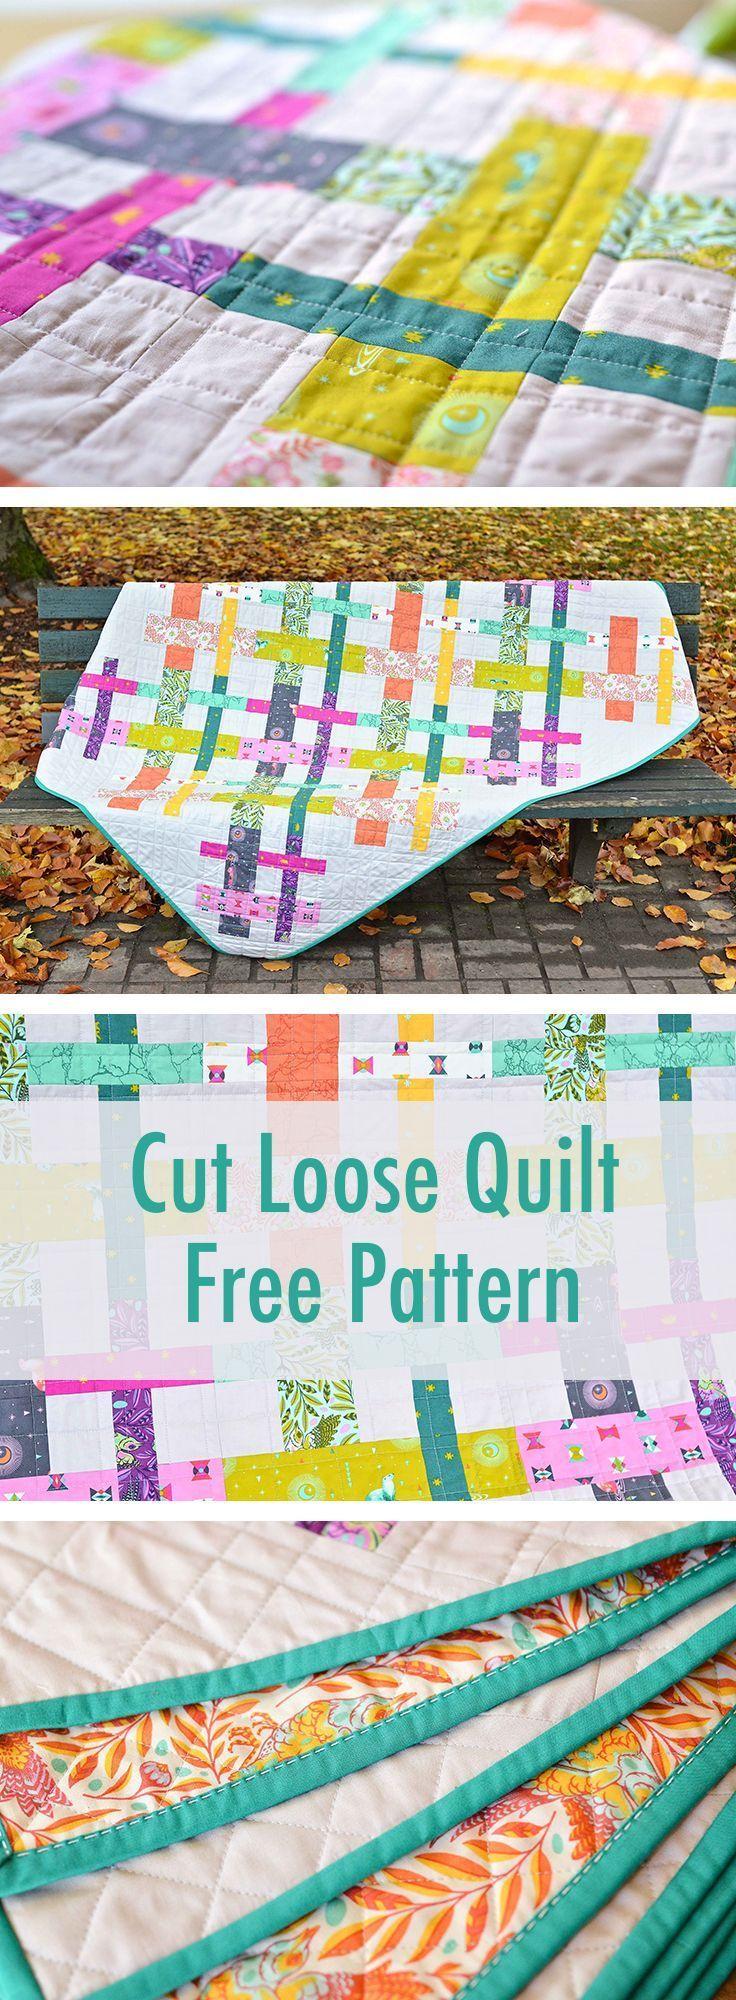 Cut Loose Tula Pink Quilt